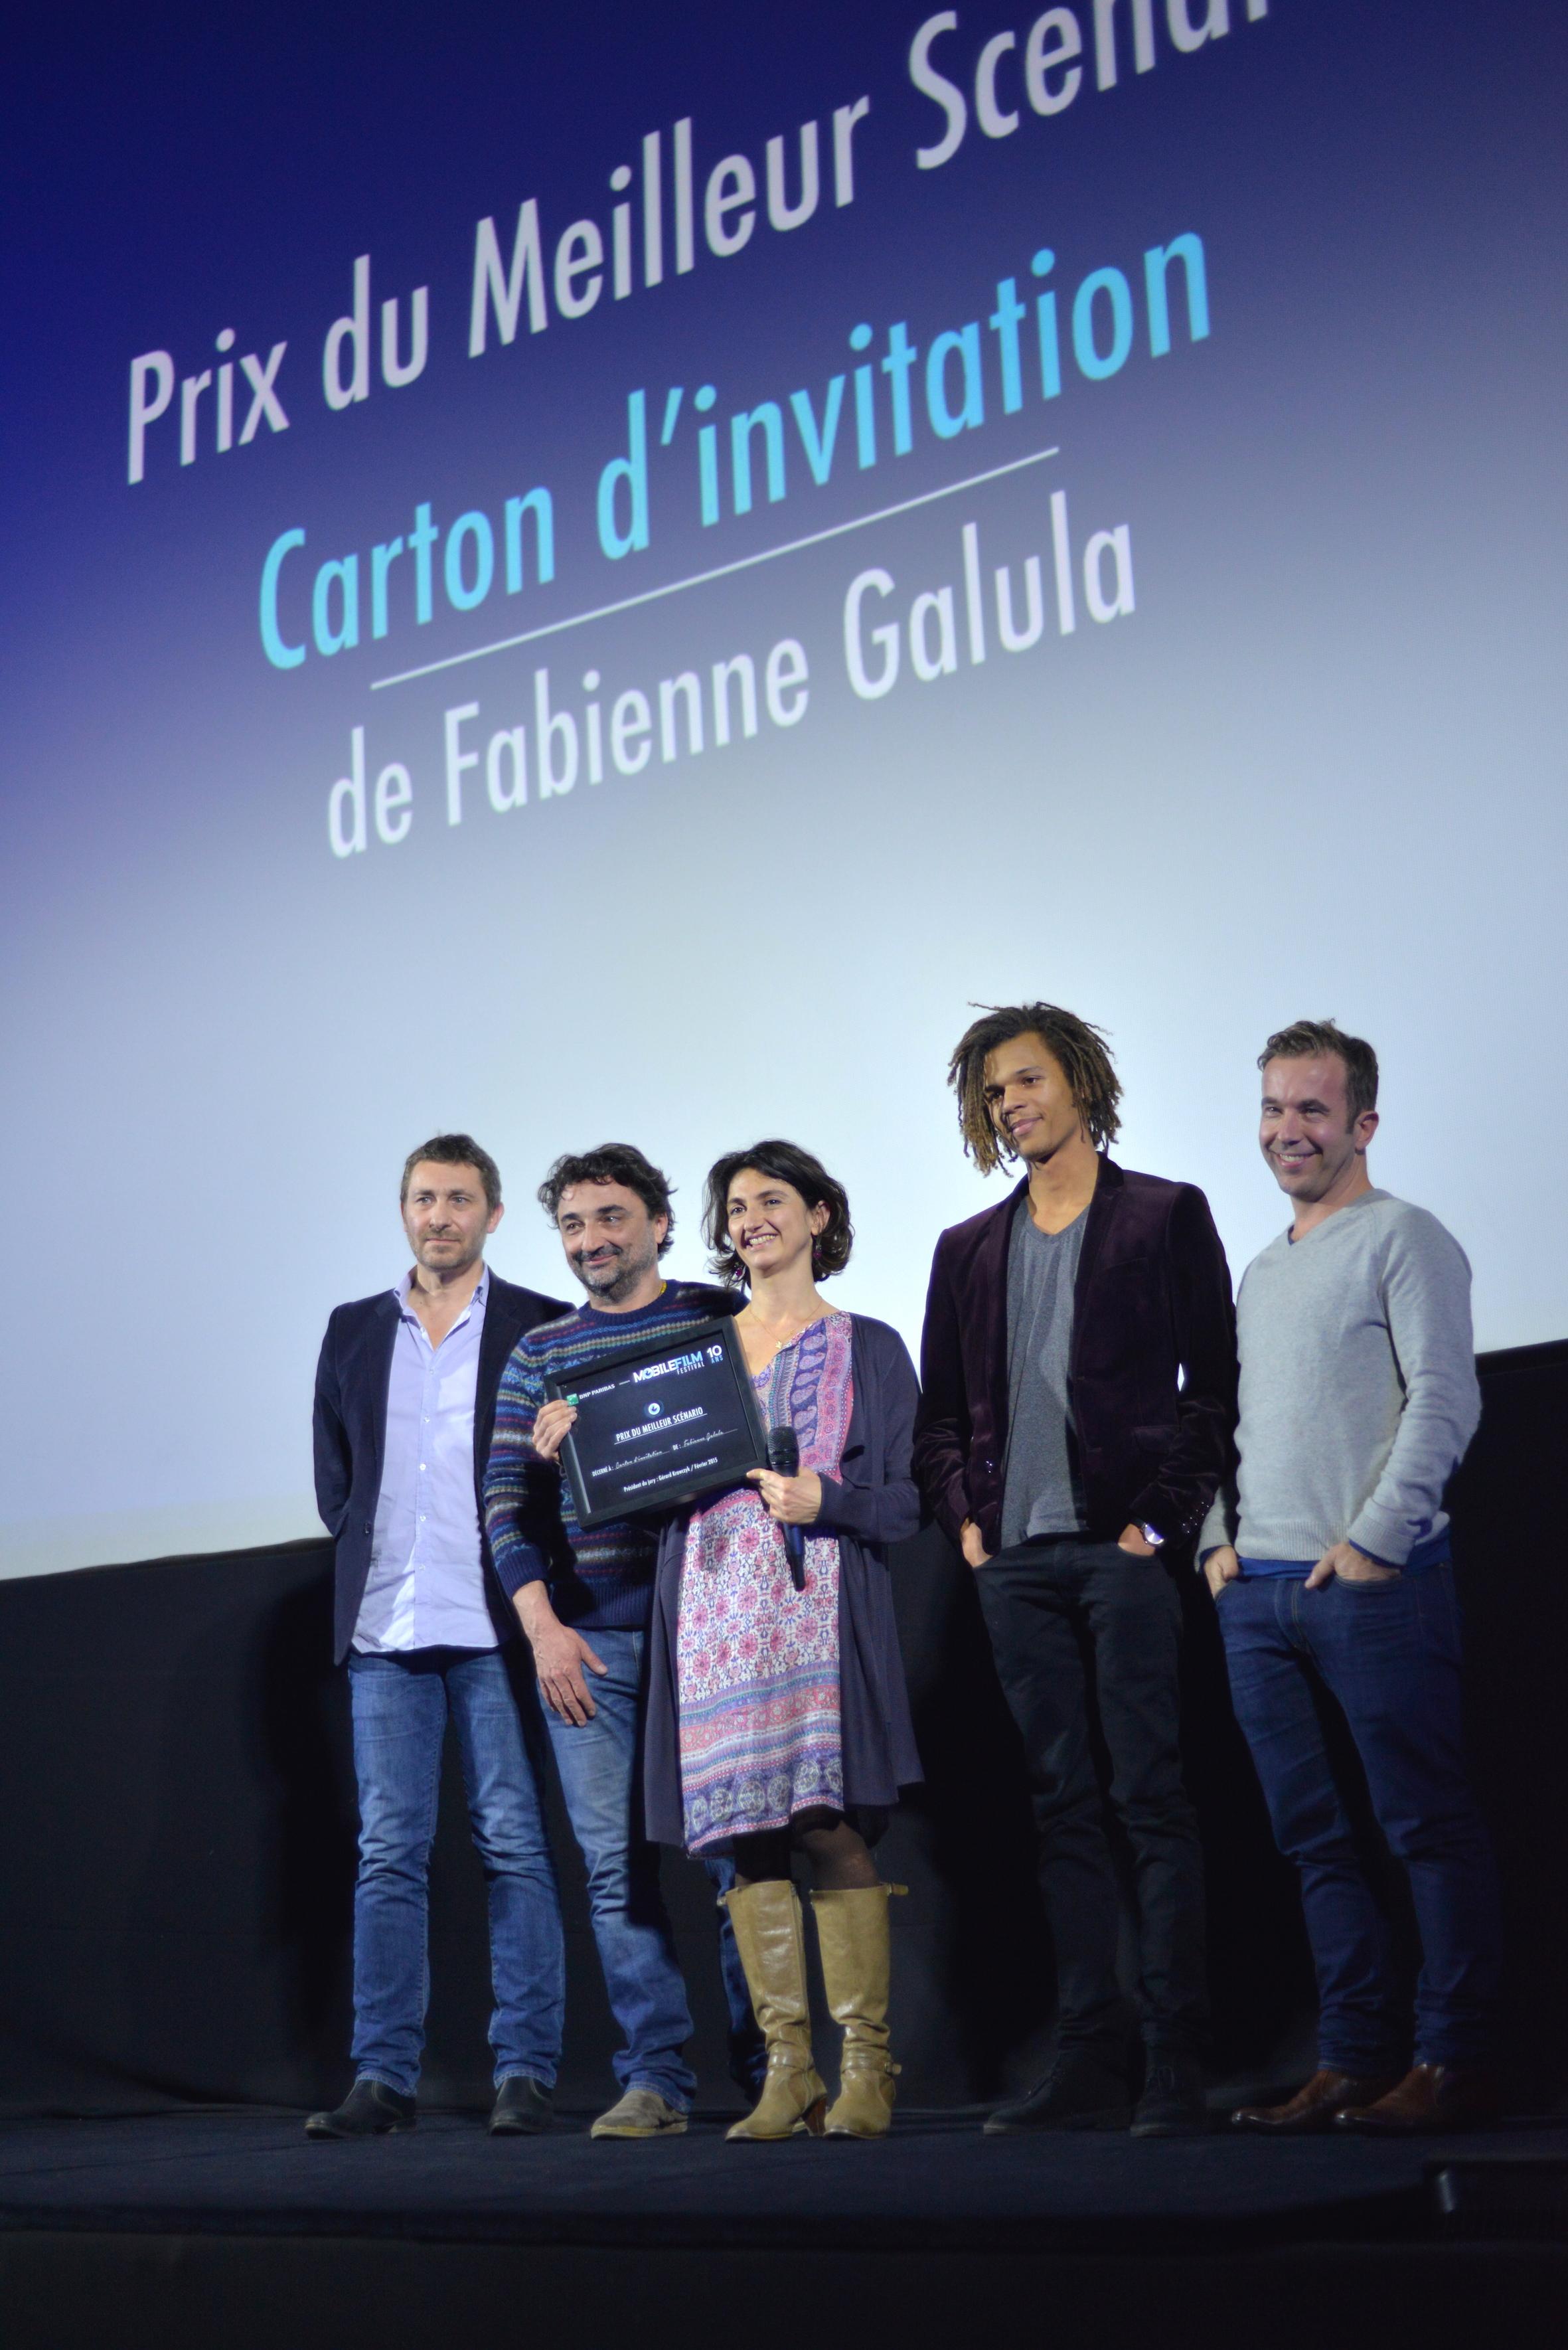 Fabienne Galula- Prix du Meilleur Scénario